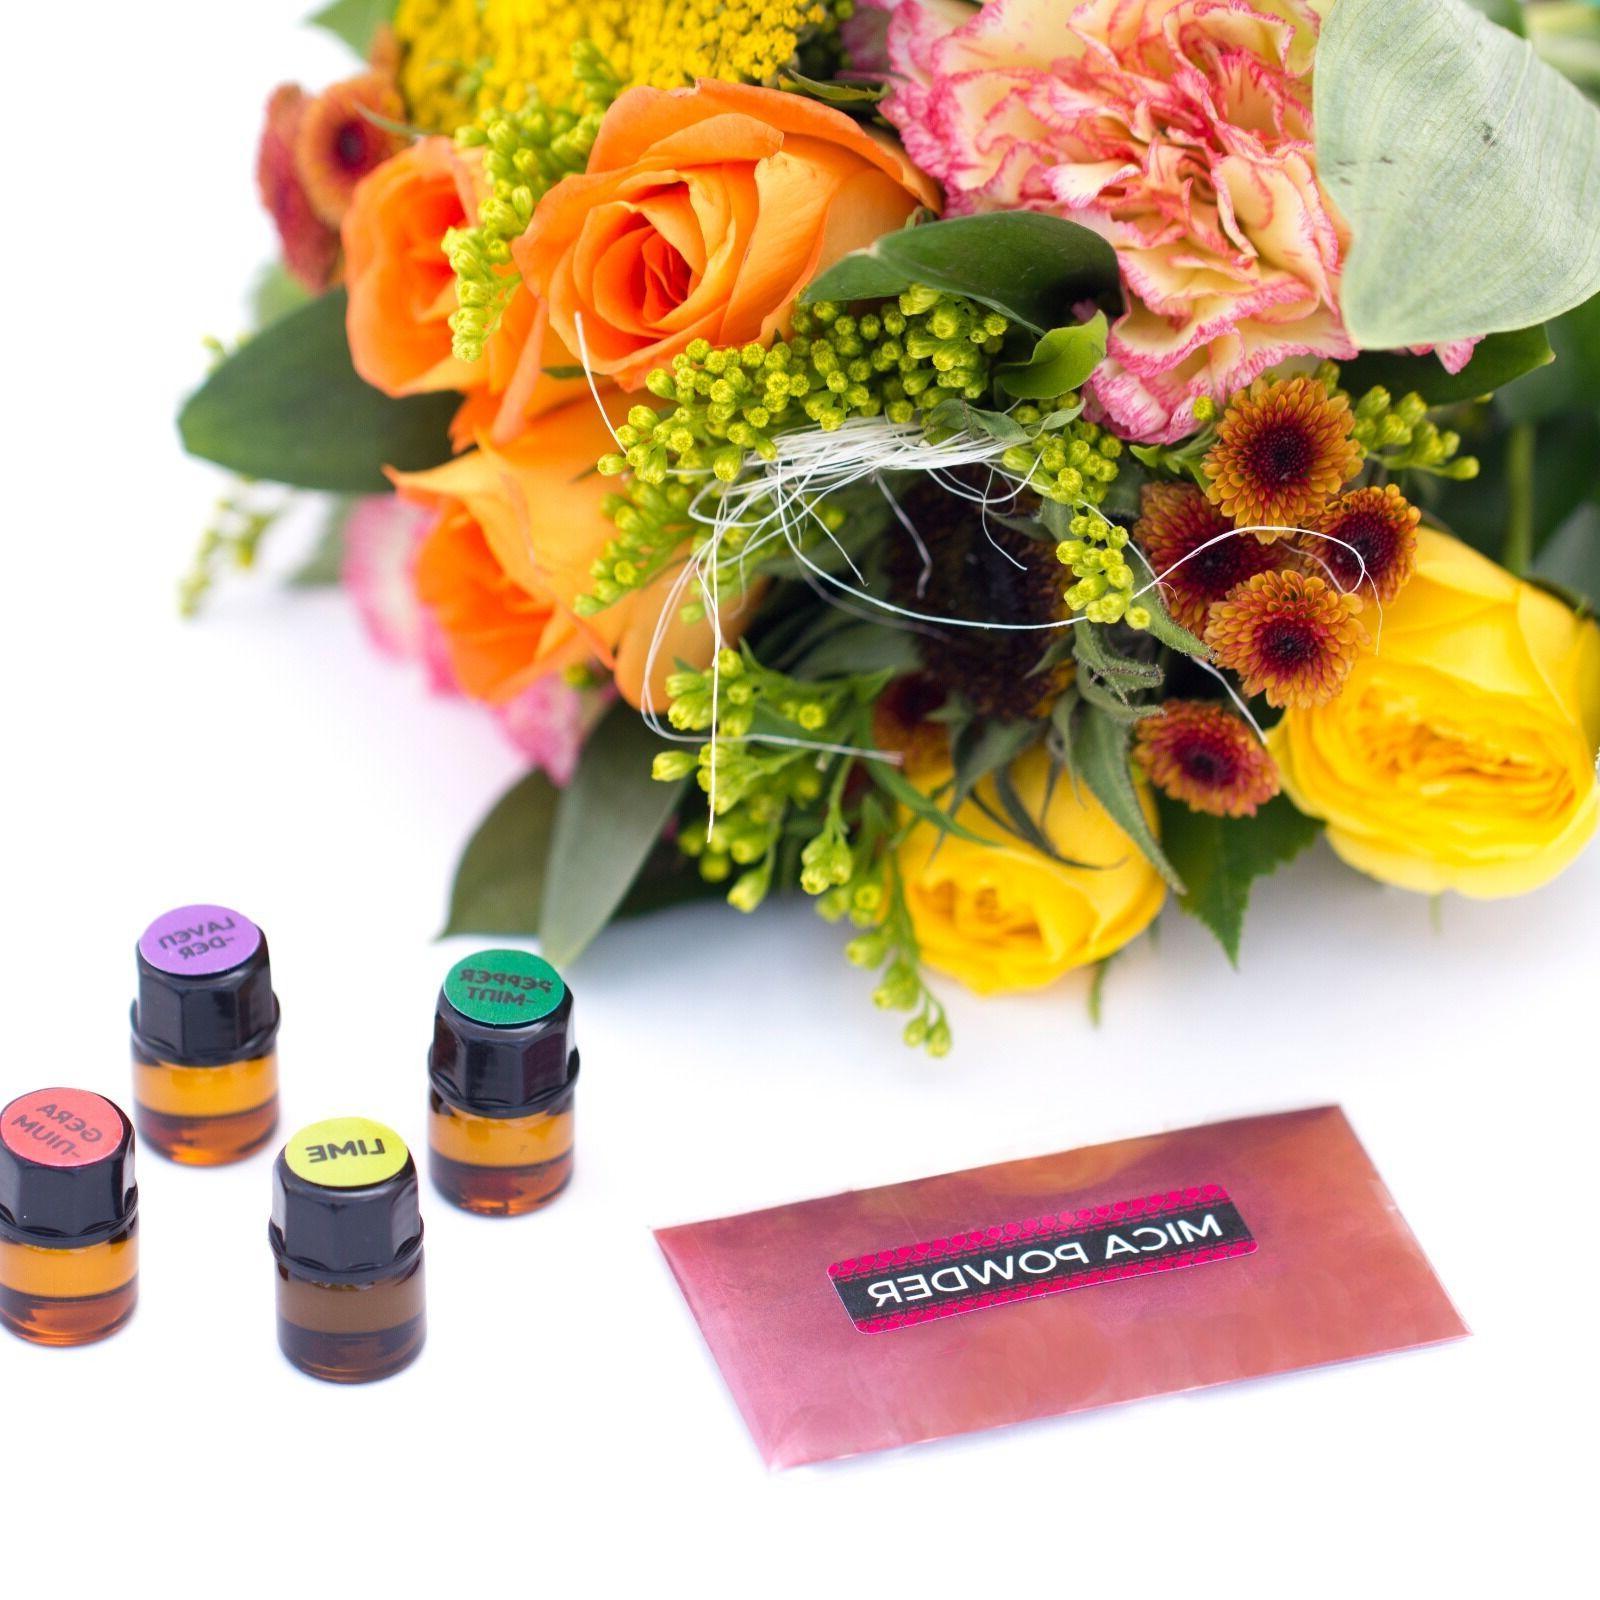 DIY Lip Balm Making Kit, Natural Organic   Includes Tubes,